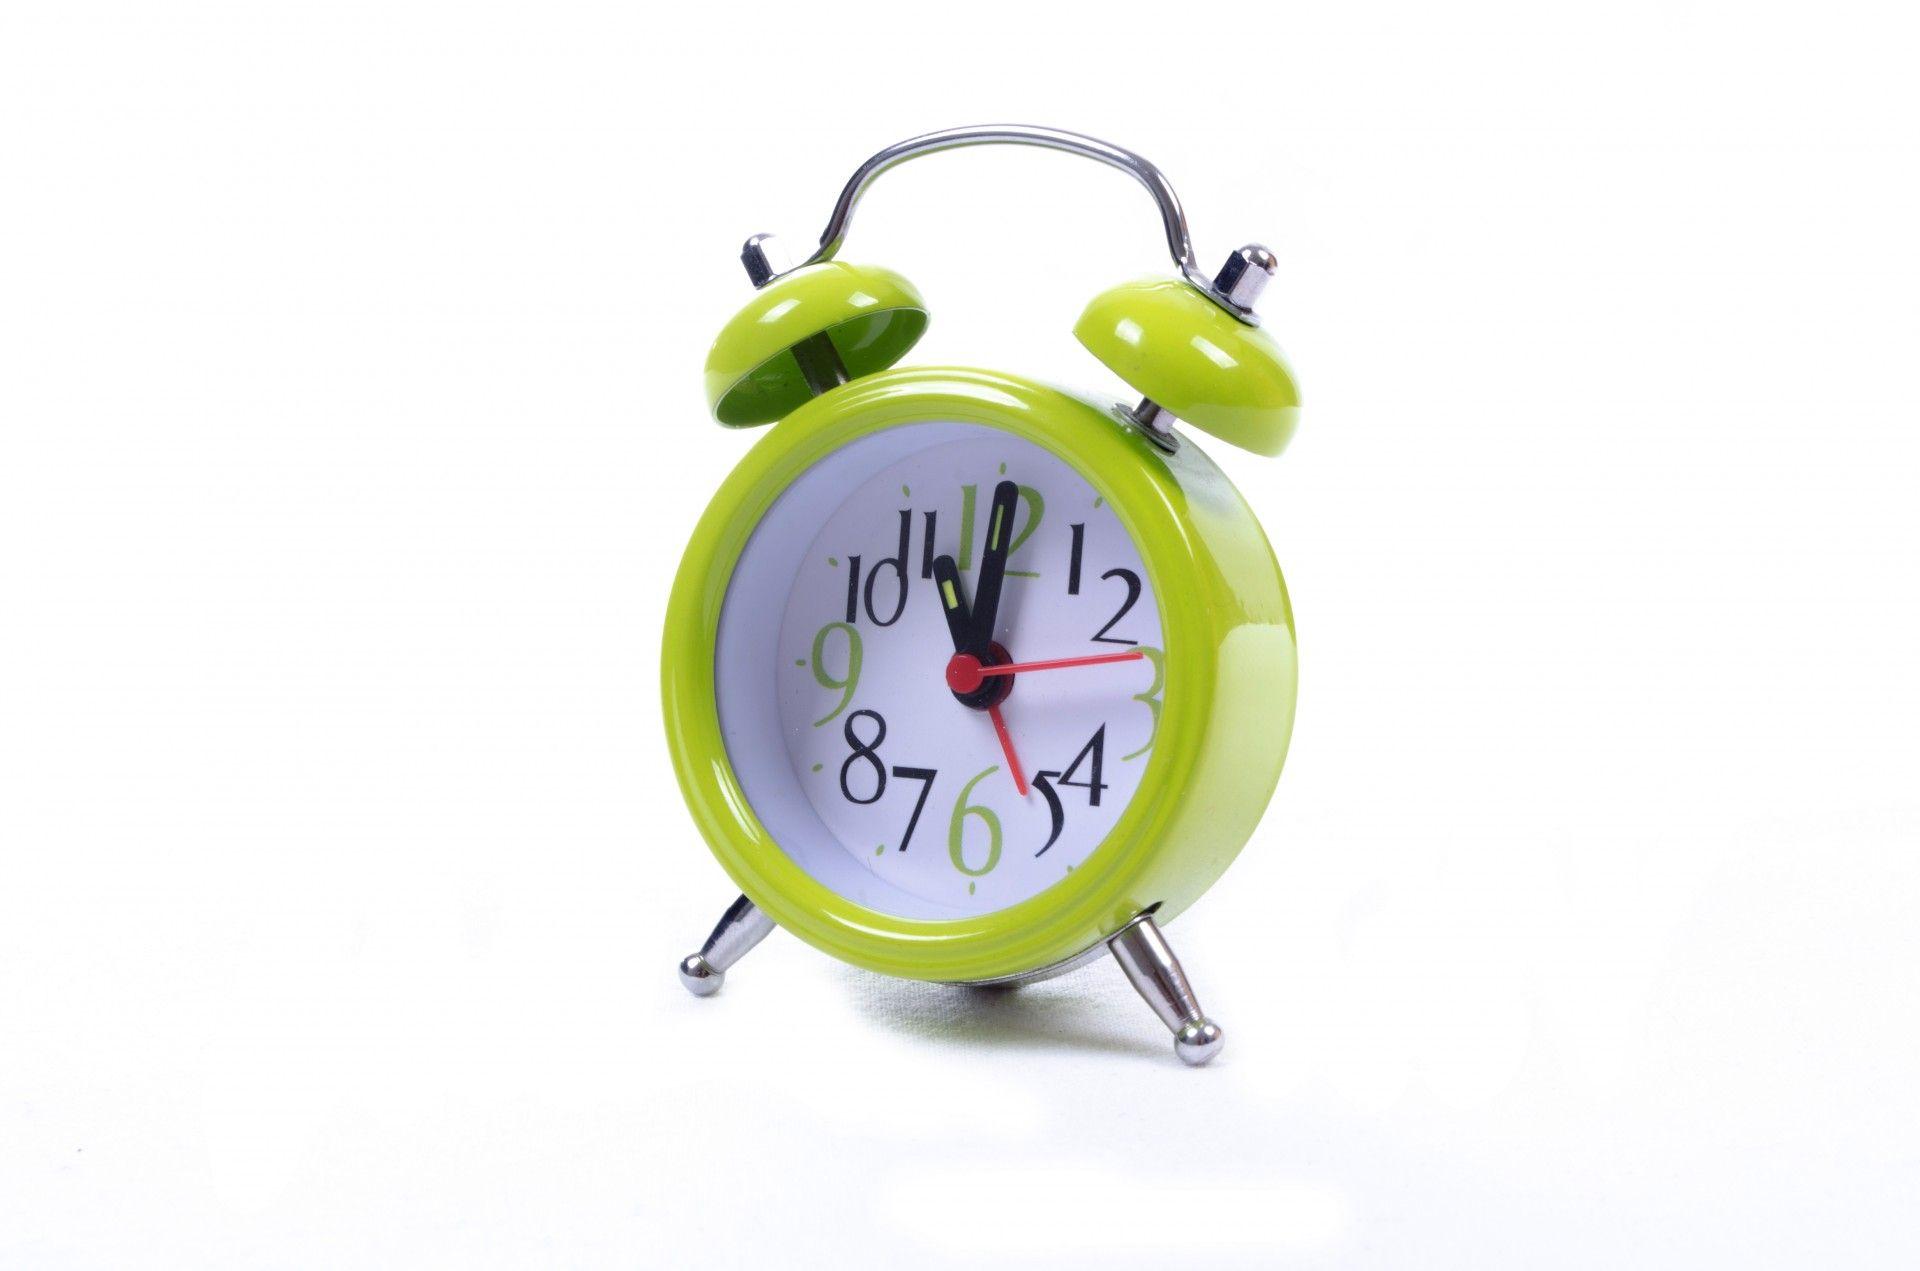 Beautiful Green Alarm Clock Wallpaper Download High